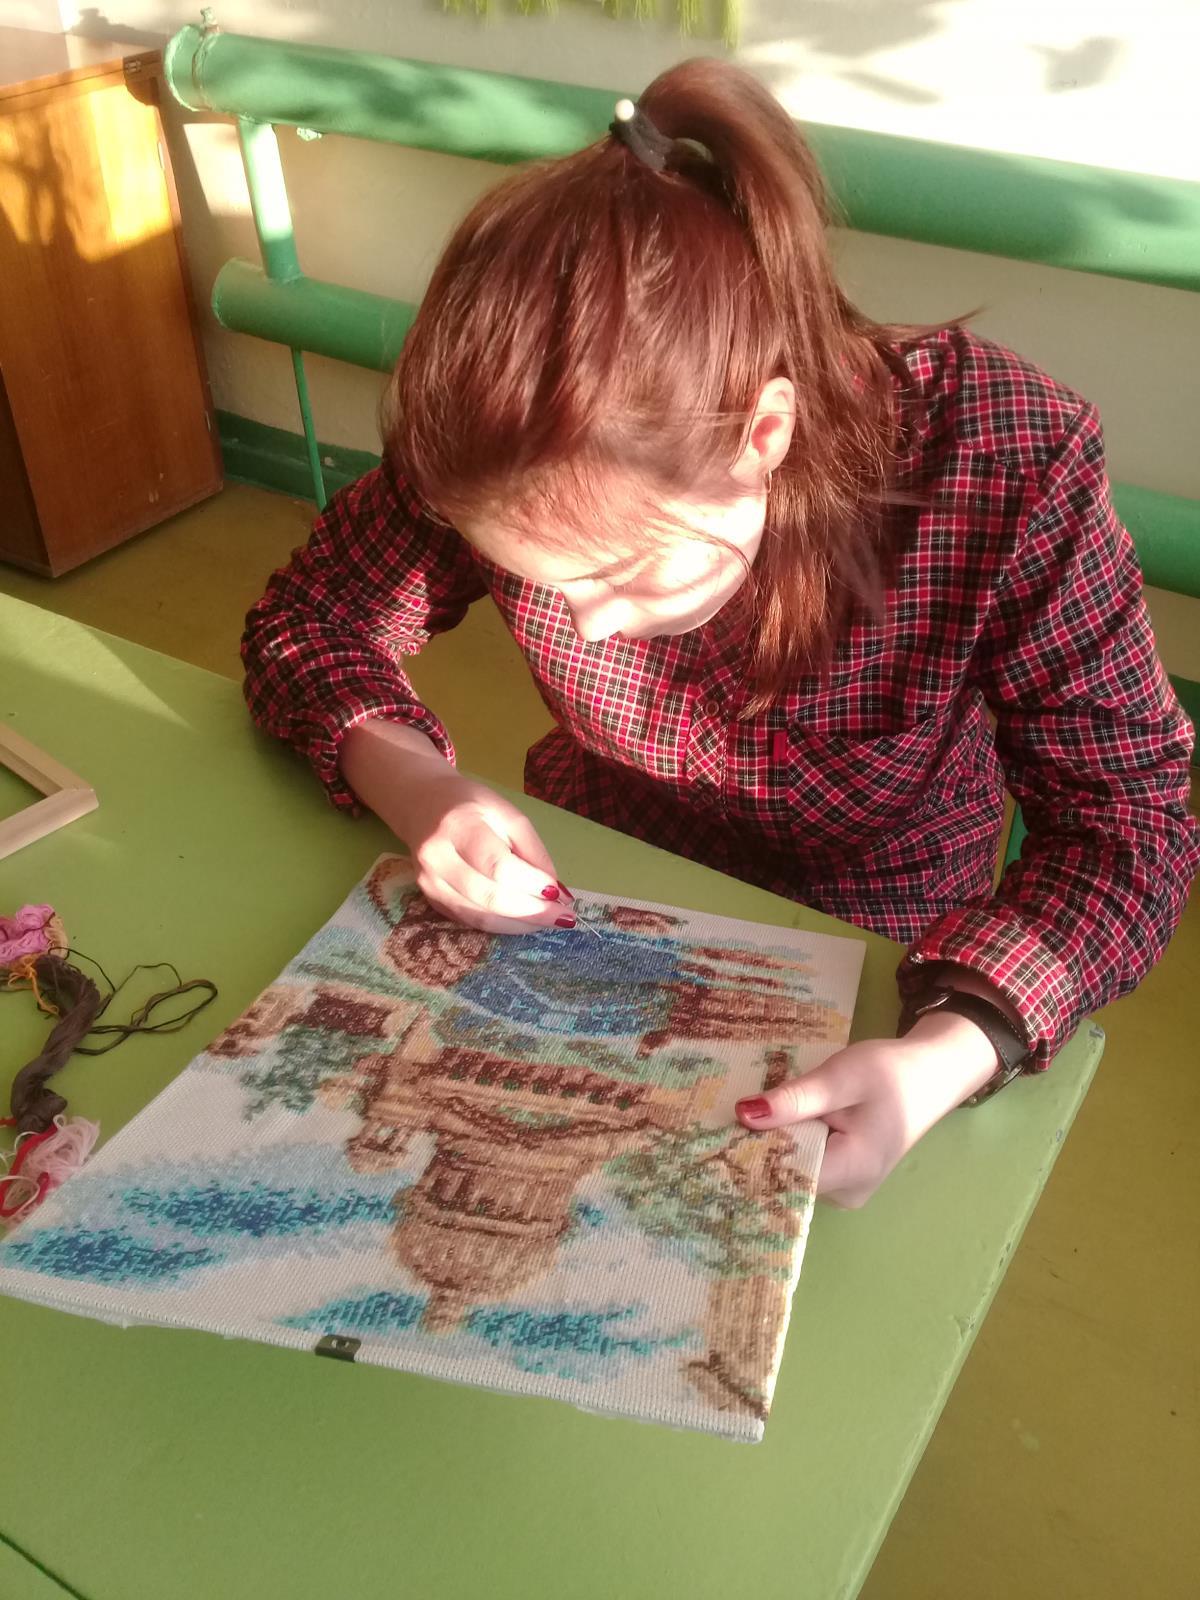 изделия Анна Радионова, конкурс радуга творчества